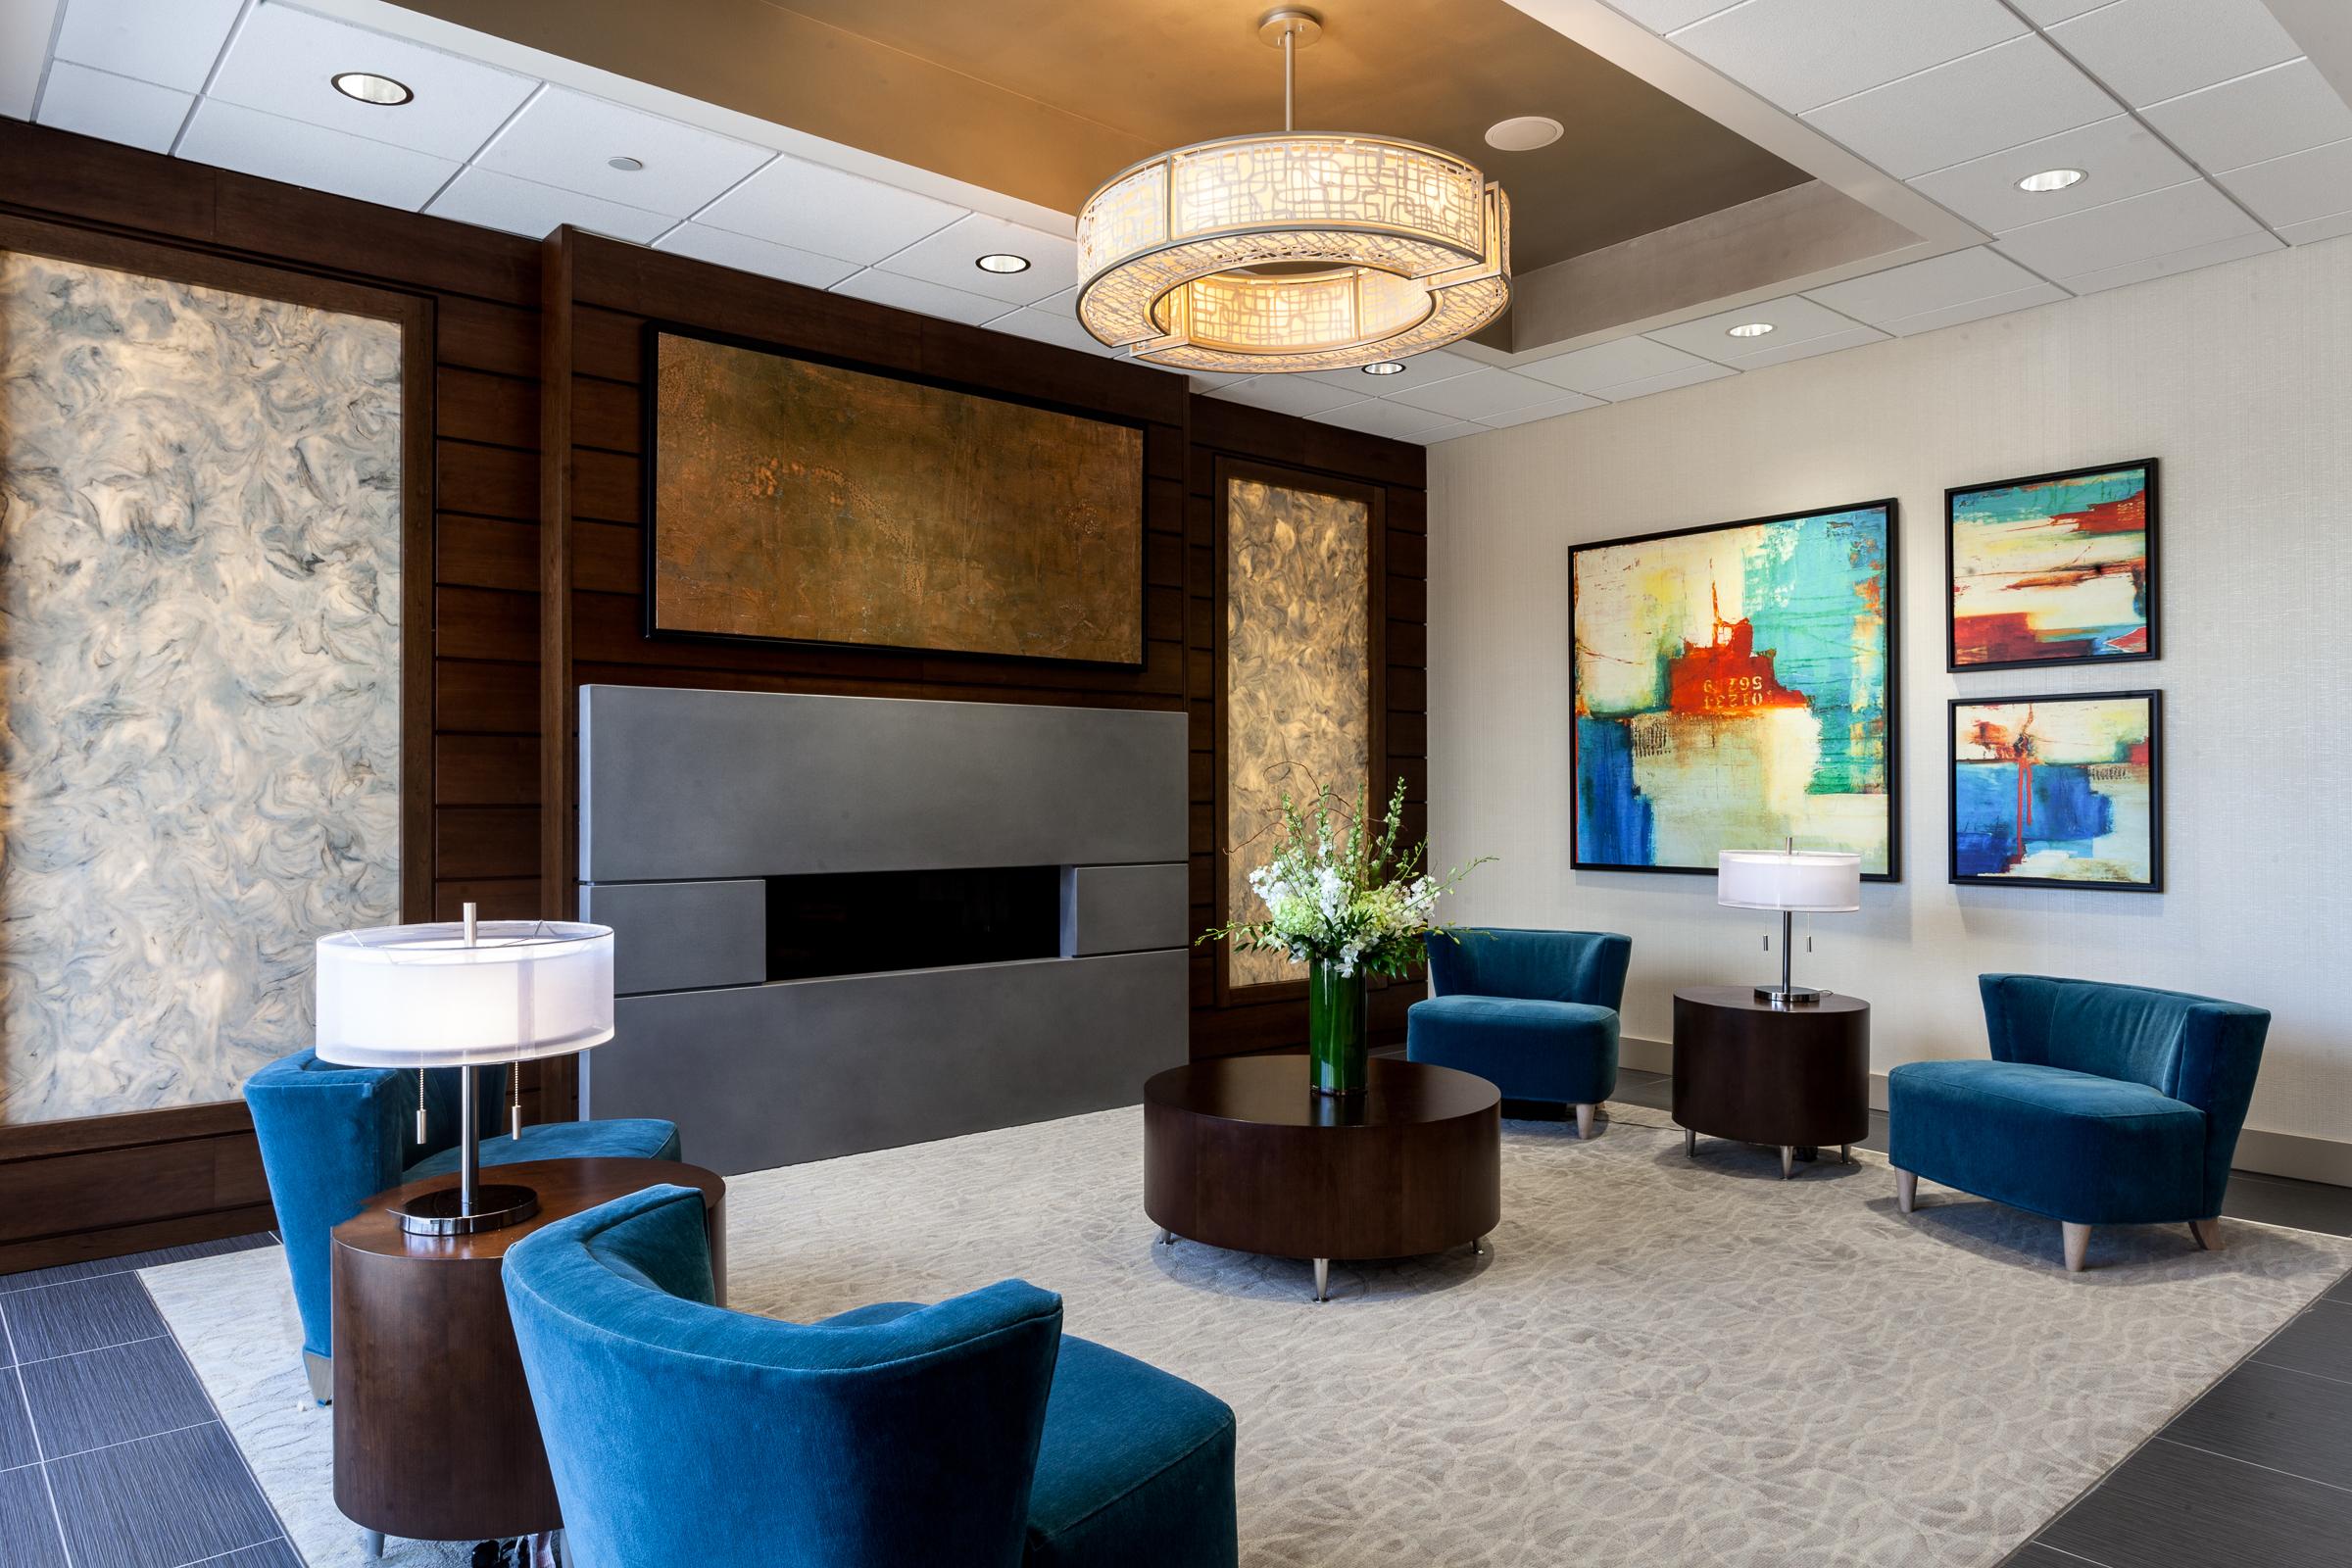 Holiday Inn Chicago North - Evanston - Stunning New Lobby (Photo: Business Wire)